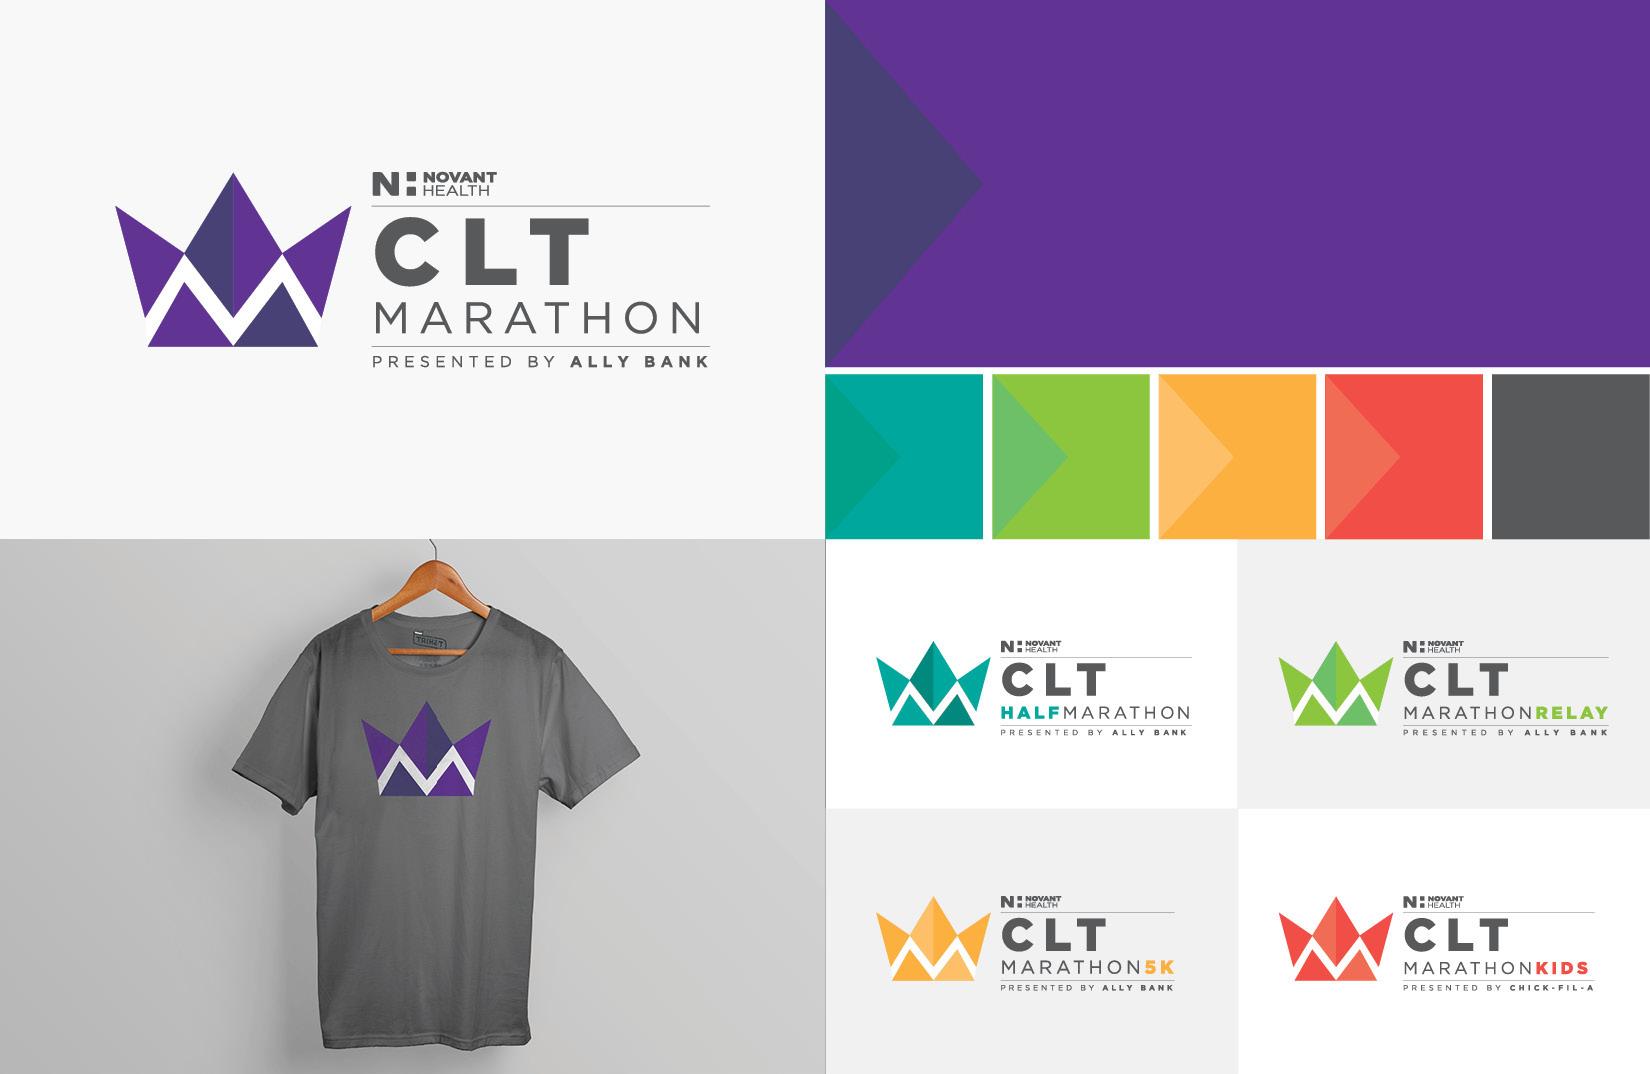 Branding_Web Images_Charlotte Marathon10.jpg